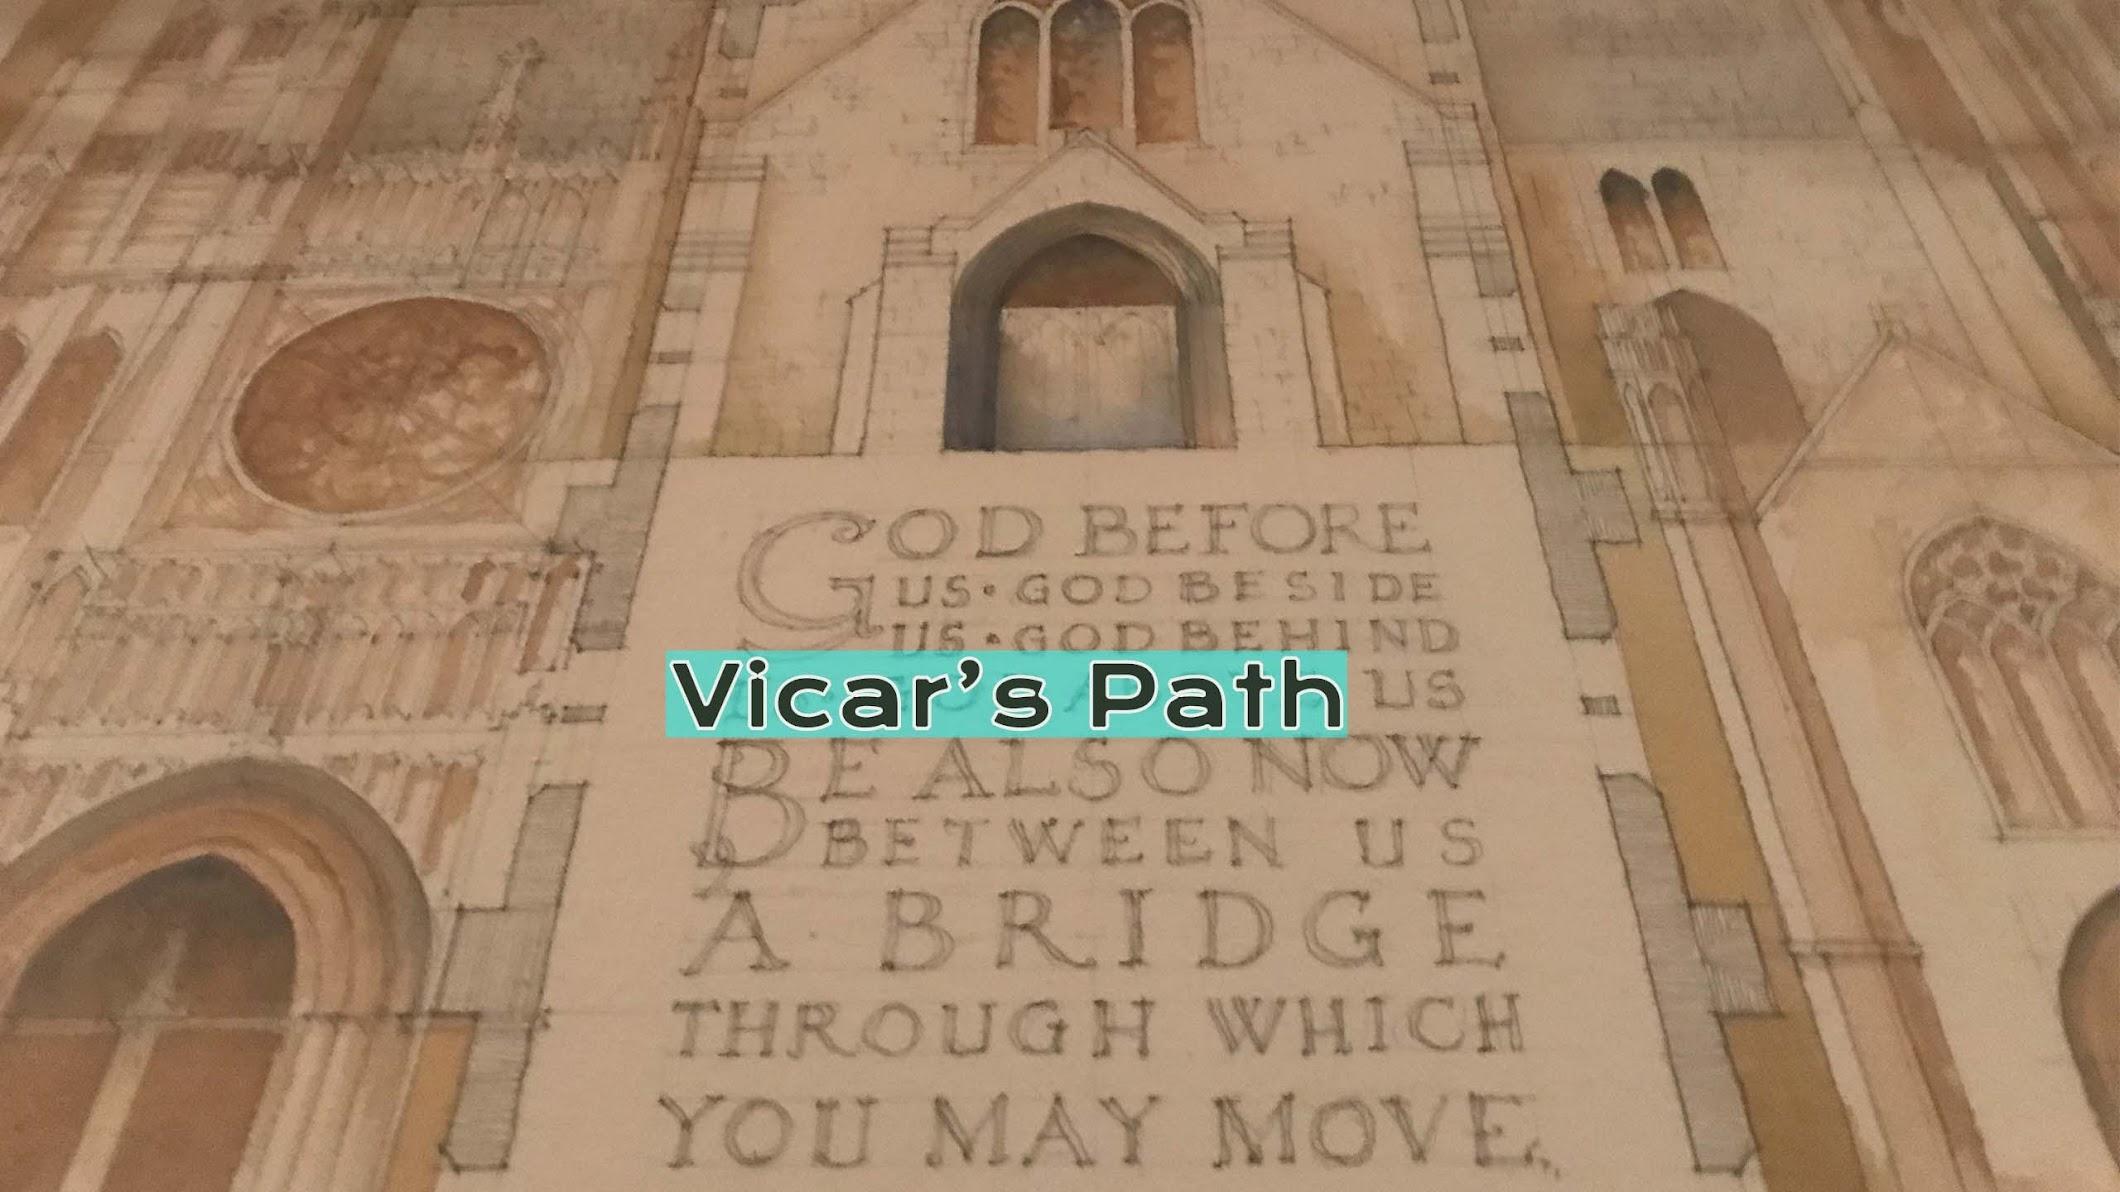 Vicar's Path